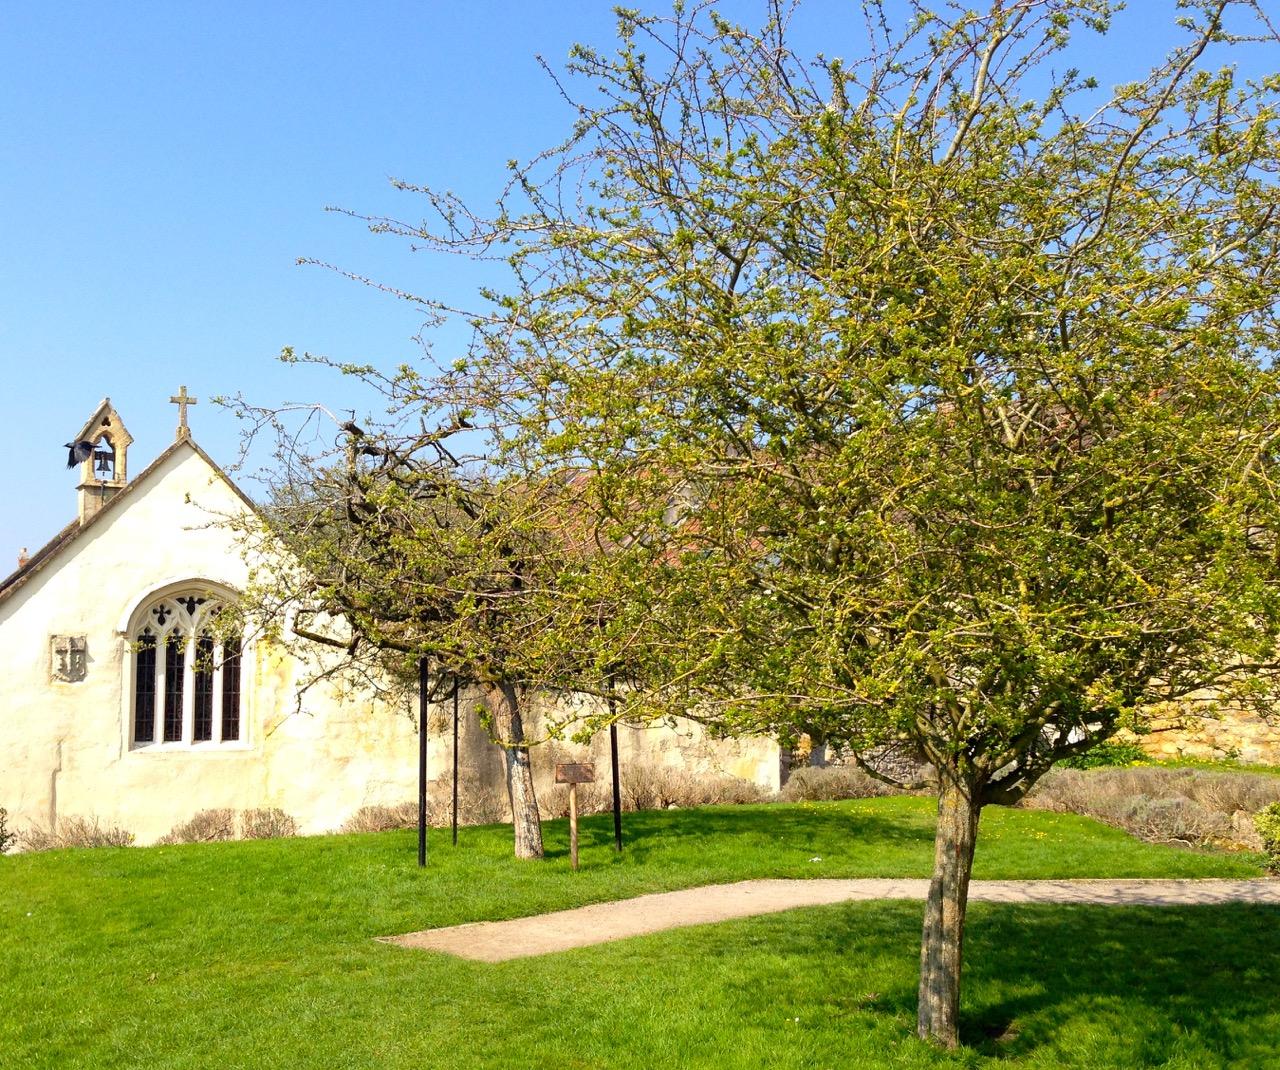 Glastonbury's Holy Thorn, planted by Joseph of Arithamea